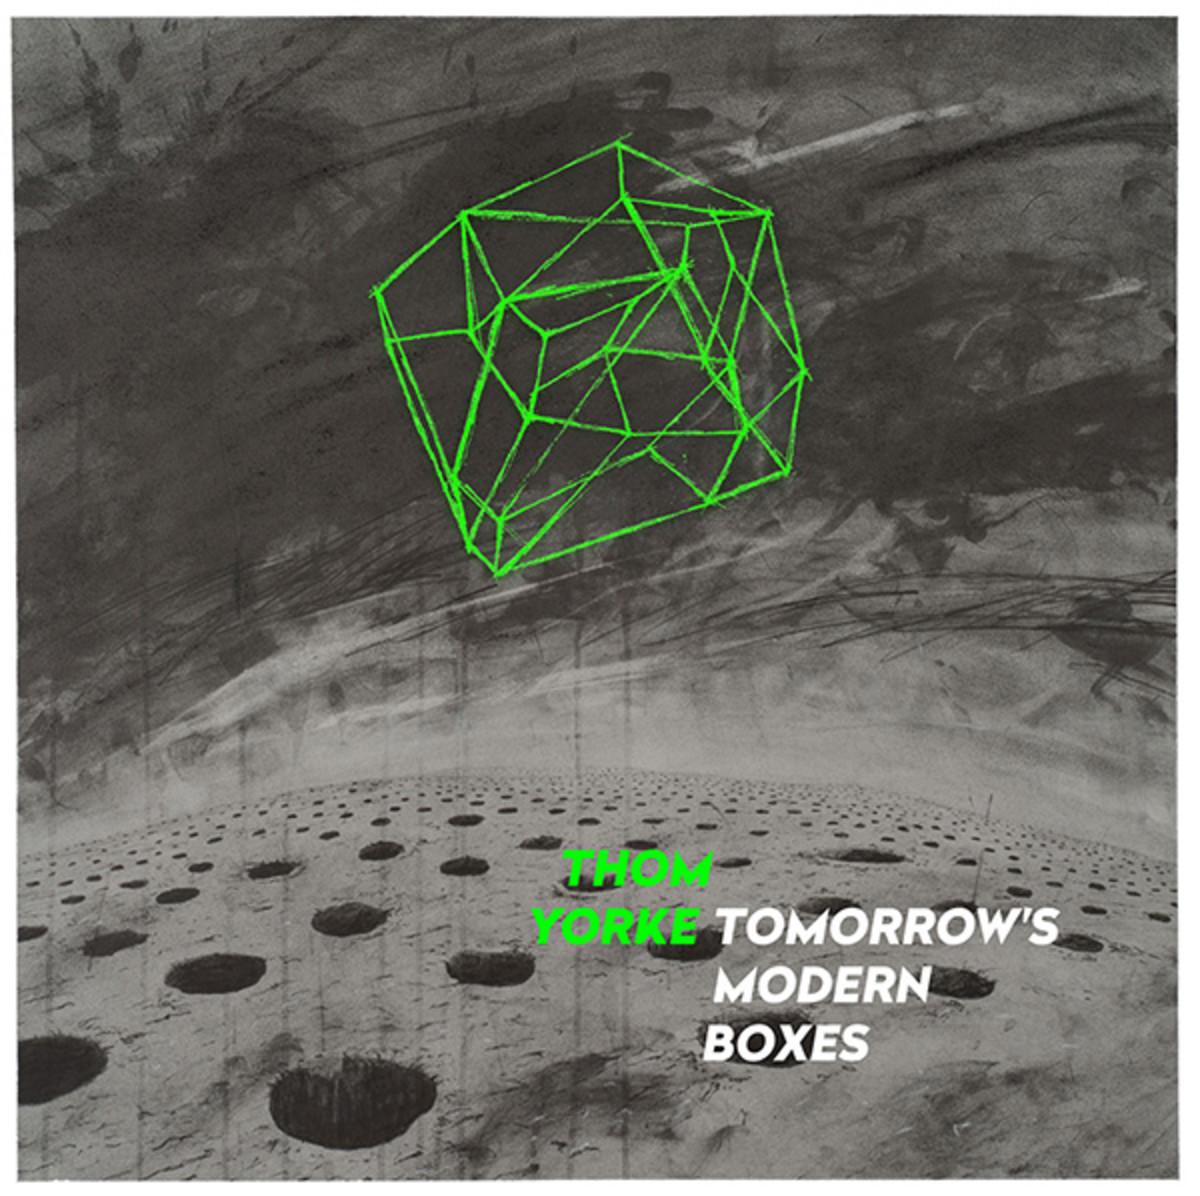 Tomorrow's Modern Boxes Album Cover